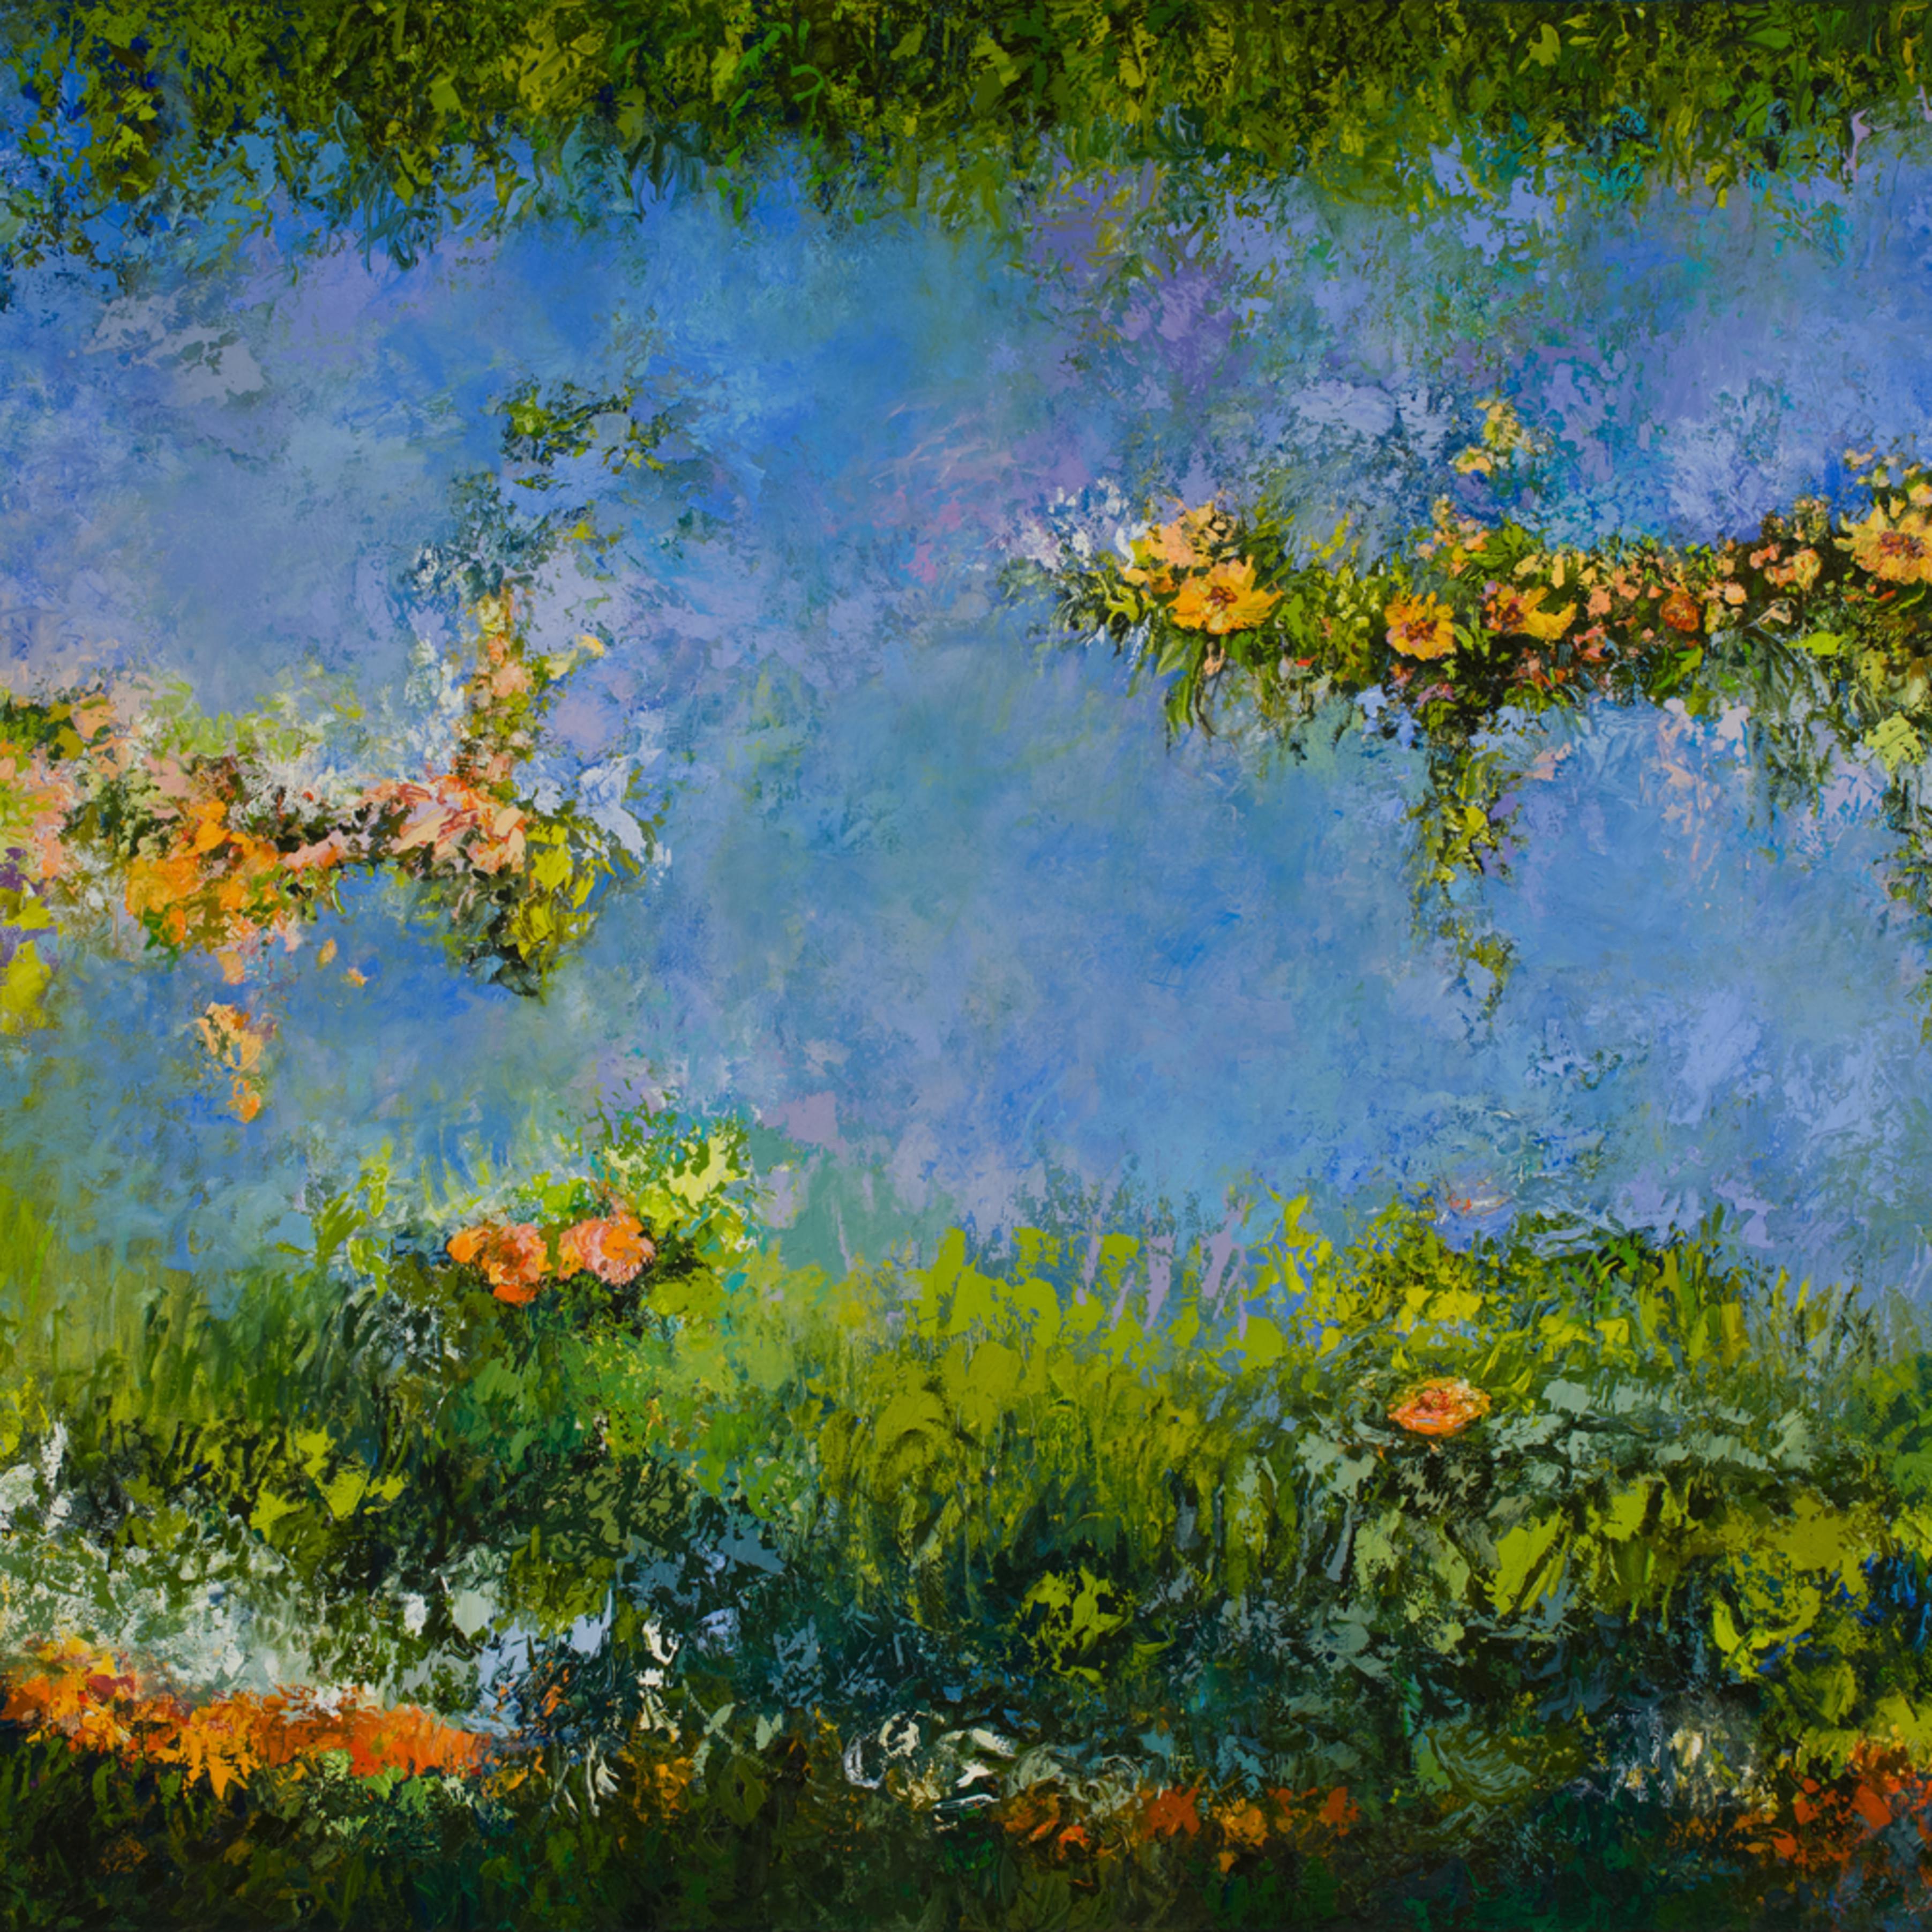 Floral wall art by tracy lynn pristas dream currency online art gallery oeraa2